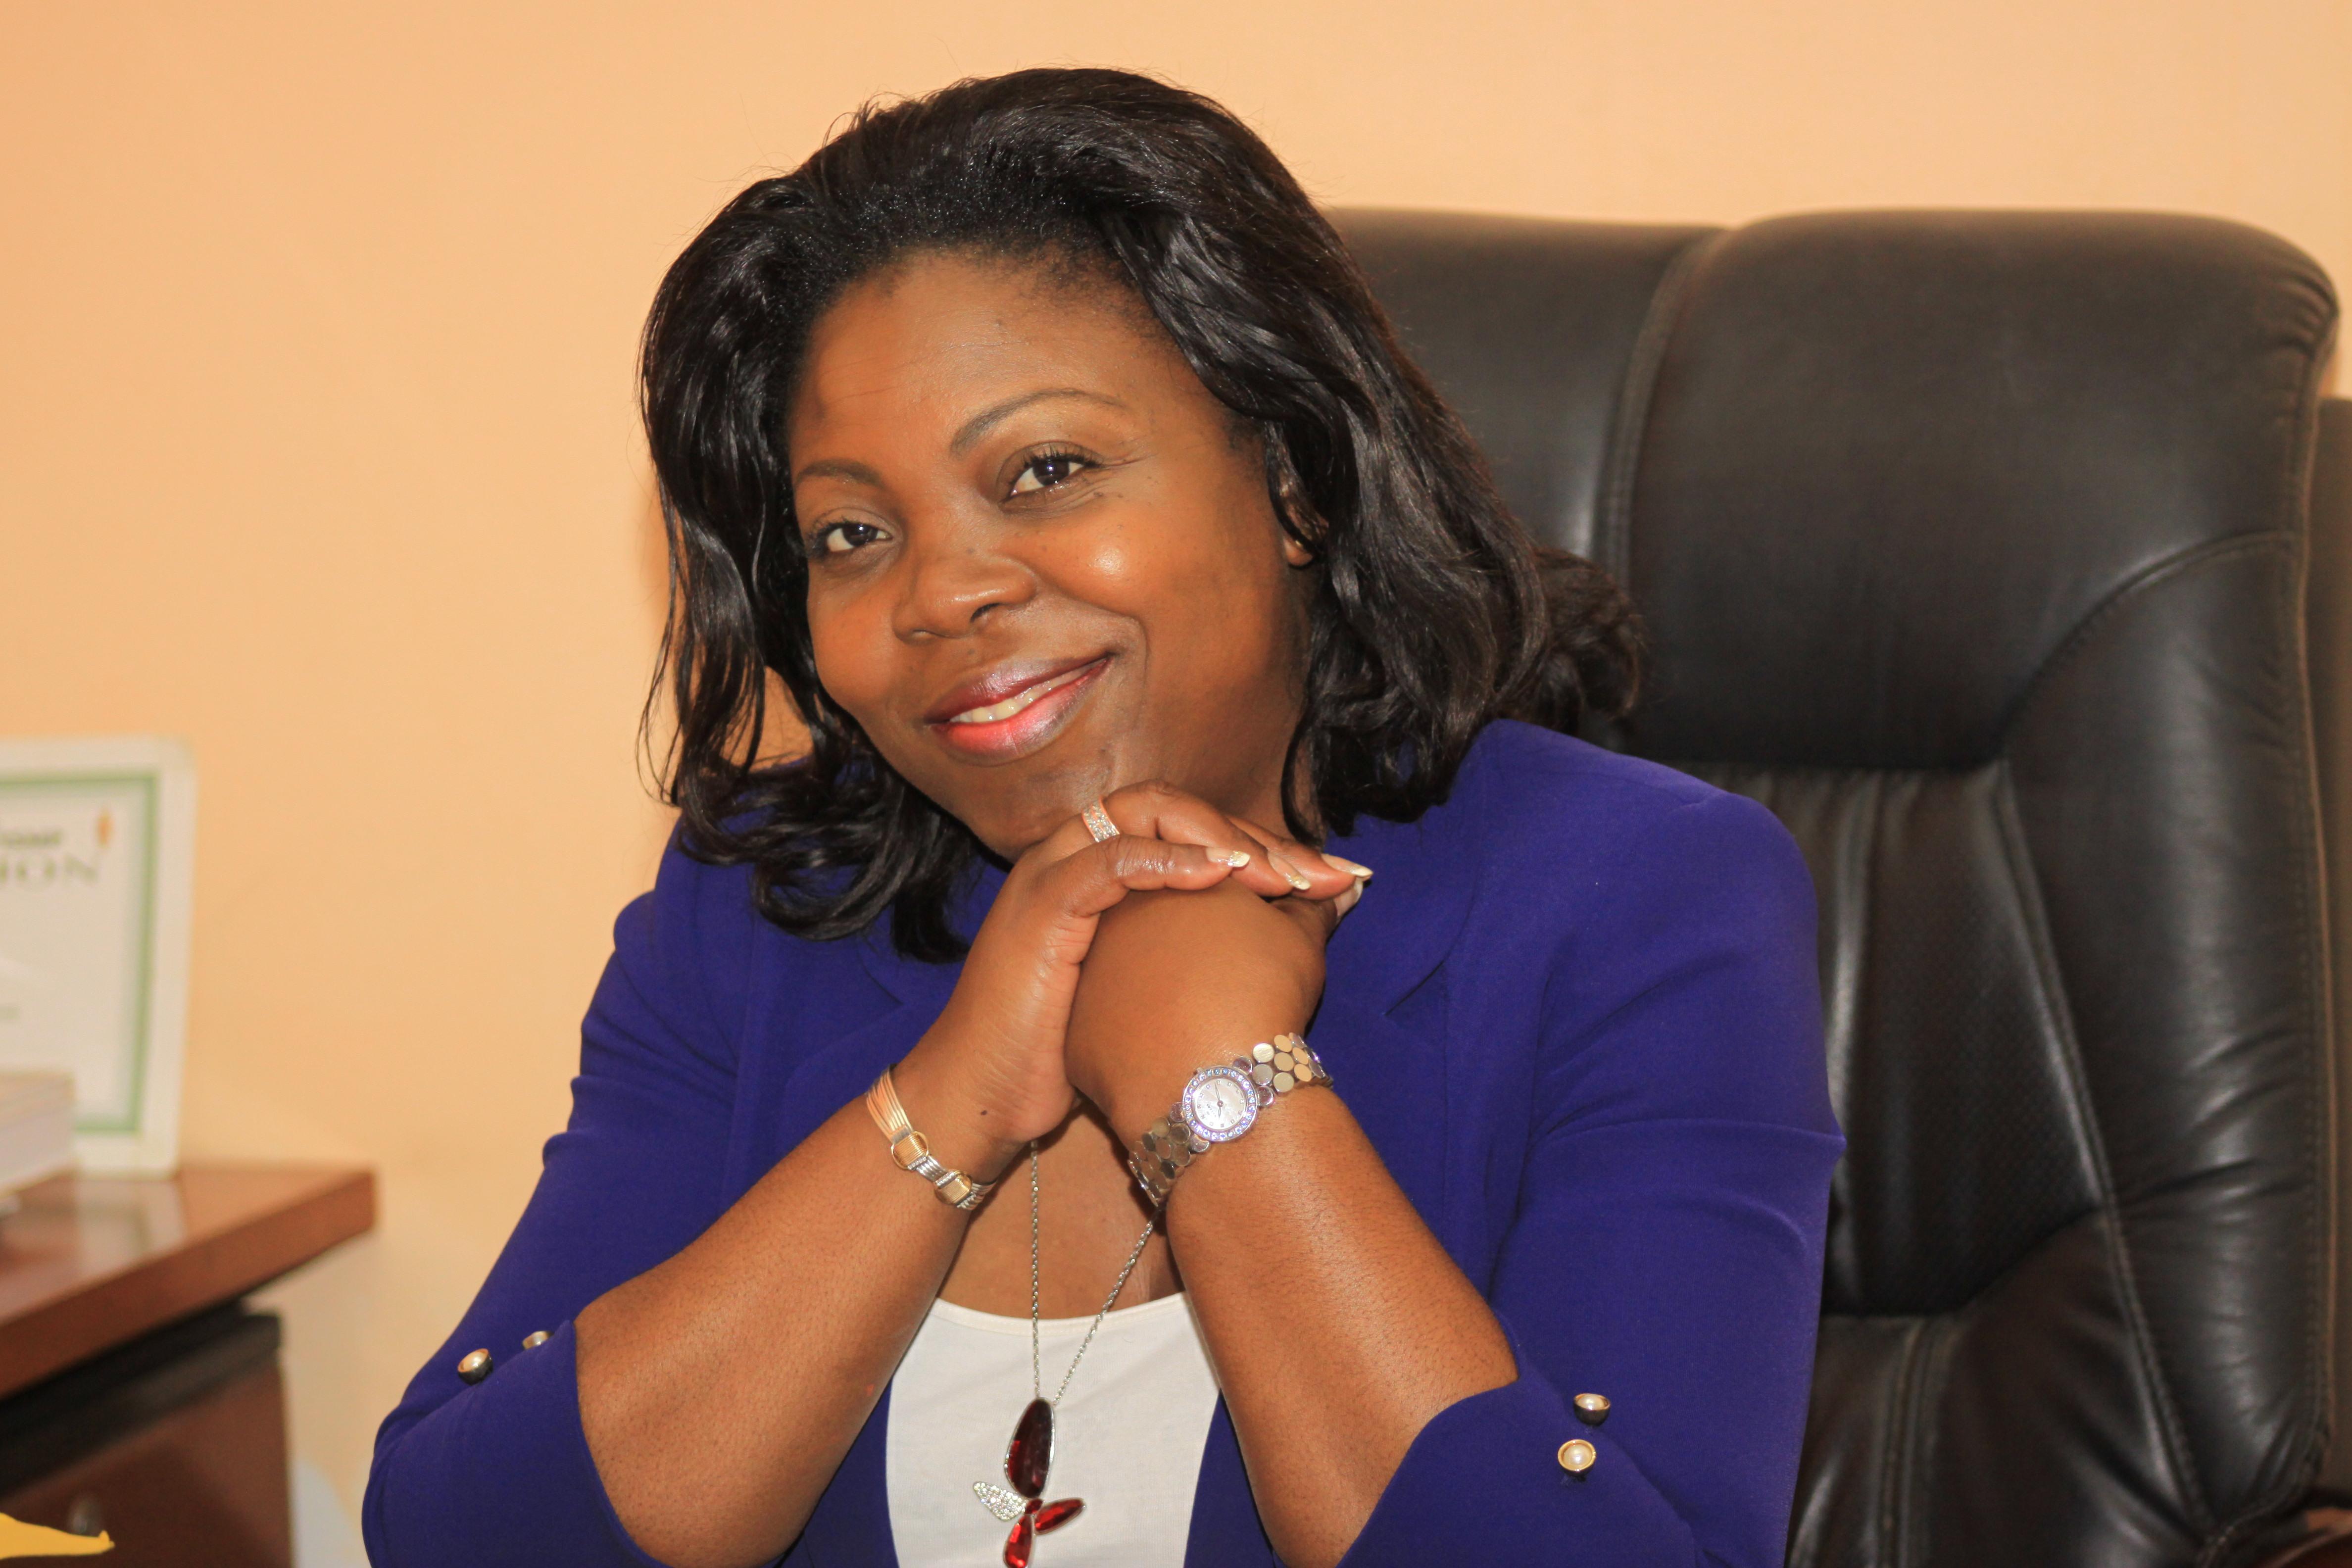 Viviane Ondoua Biwole